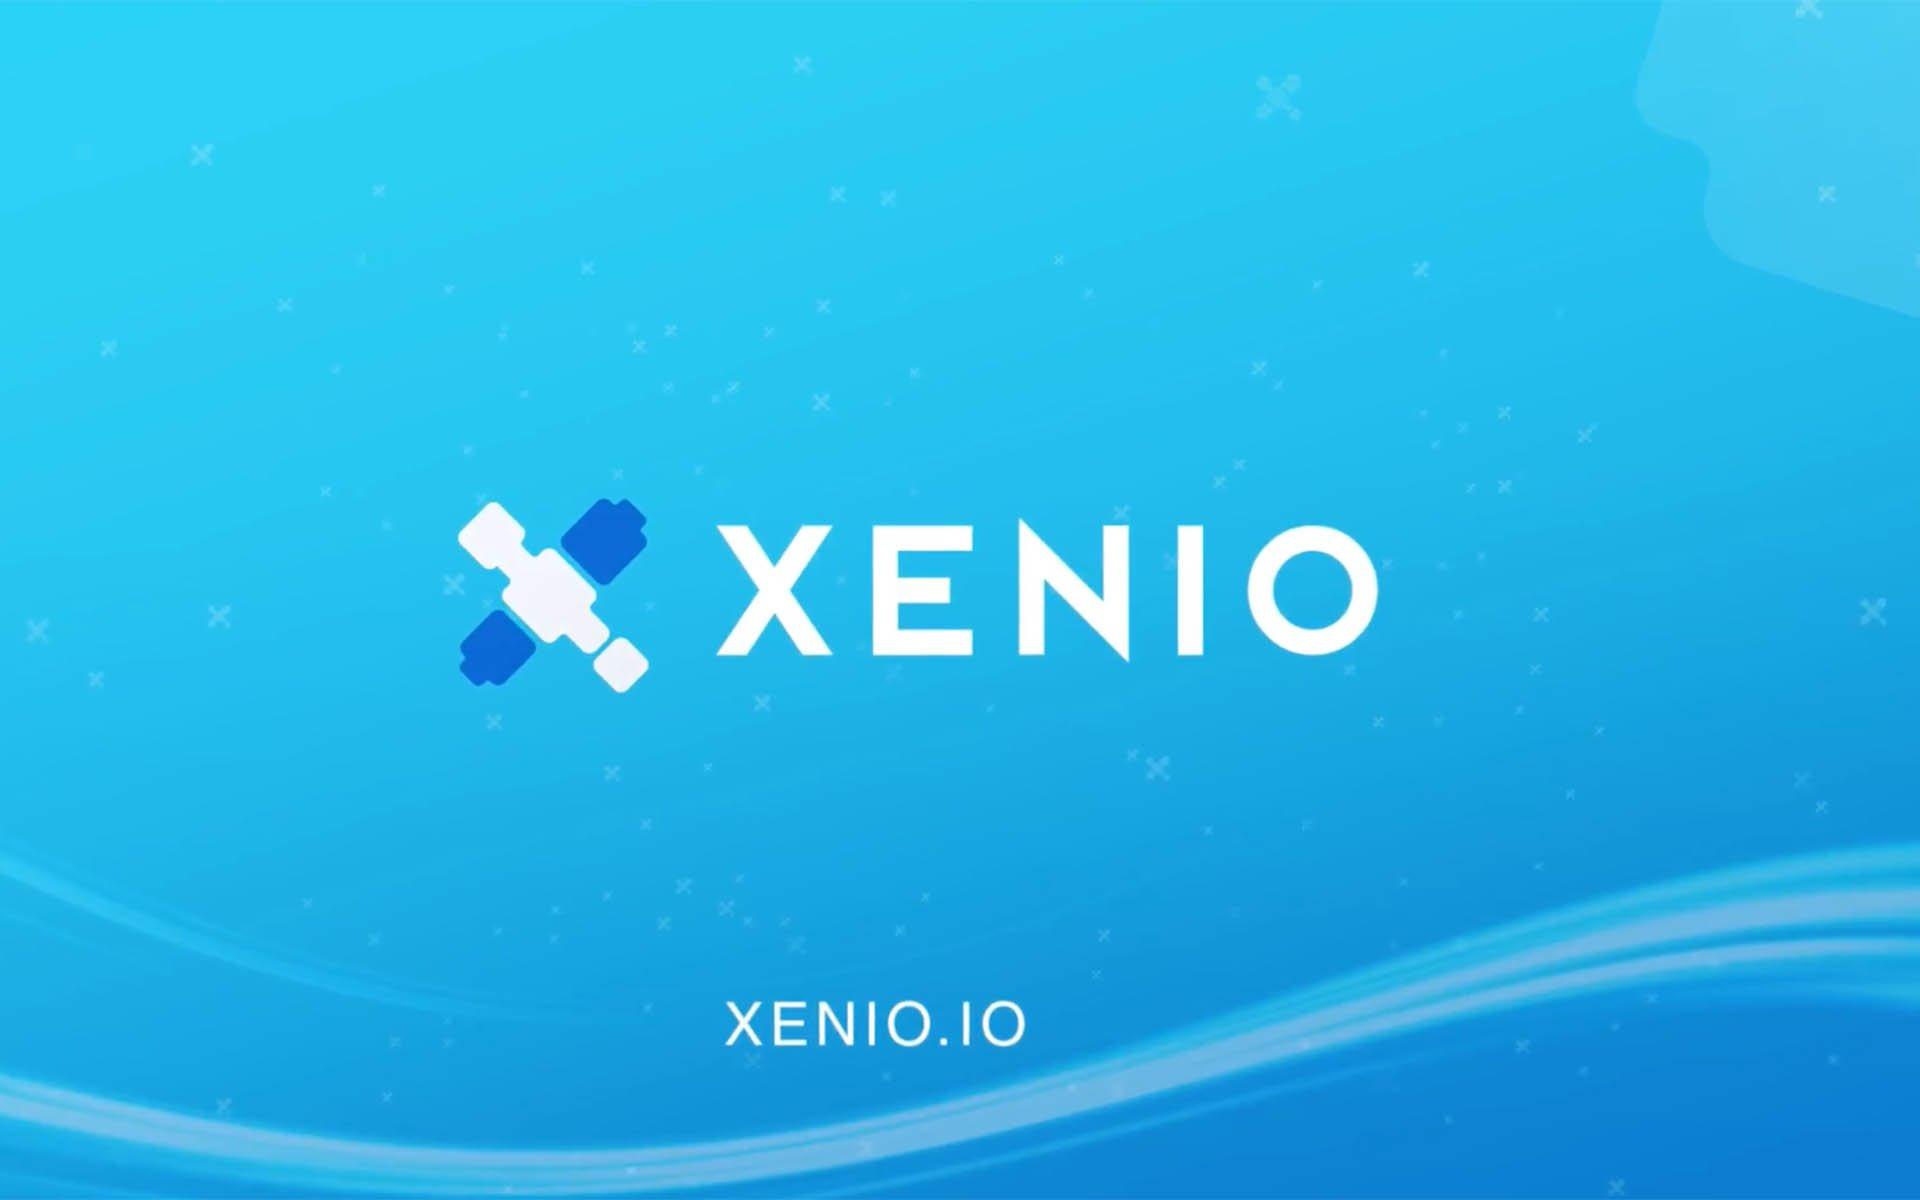 Dedicated Gaming Blockchain Xenio Announces Platform Development